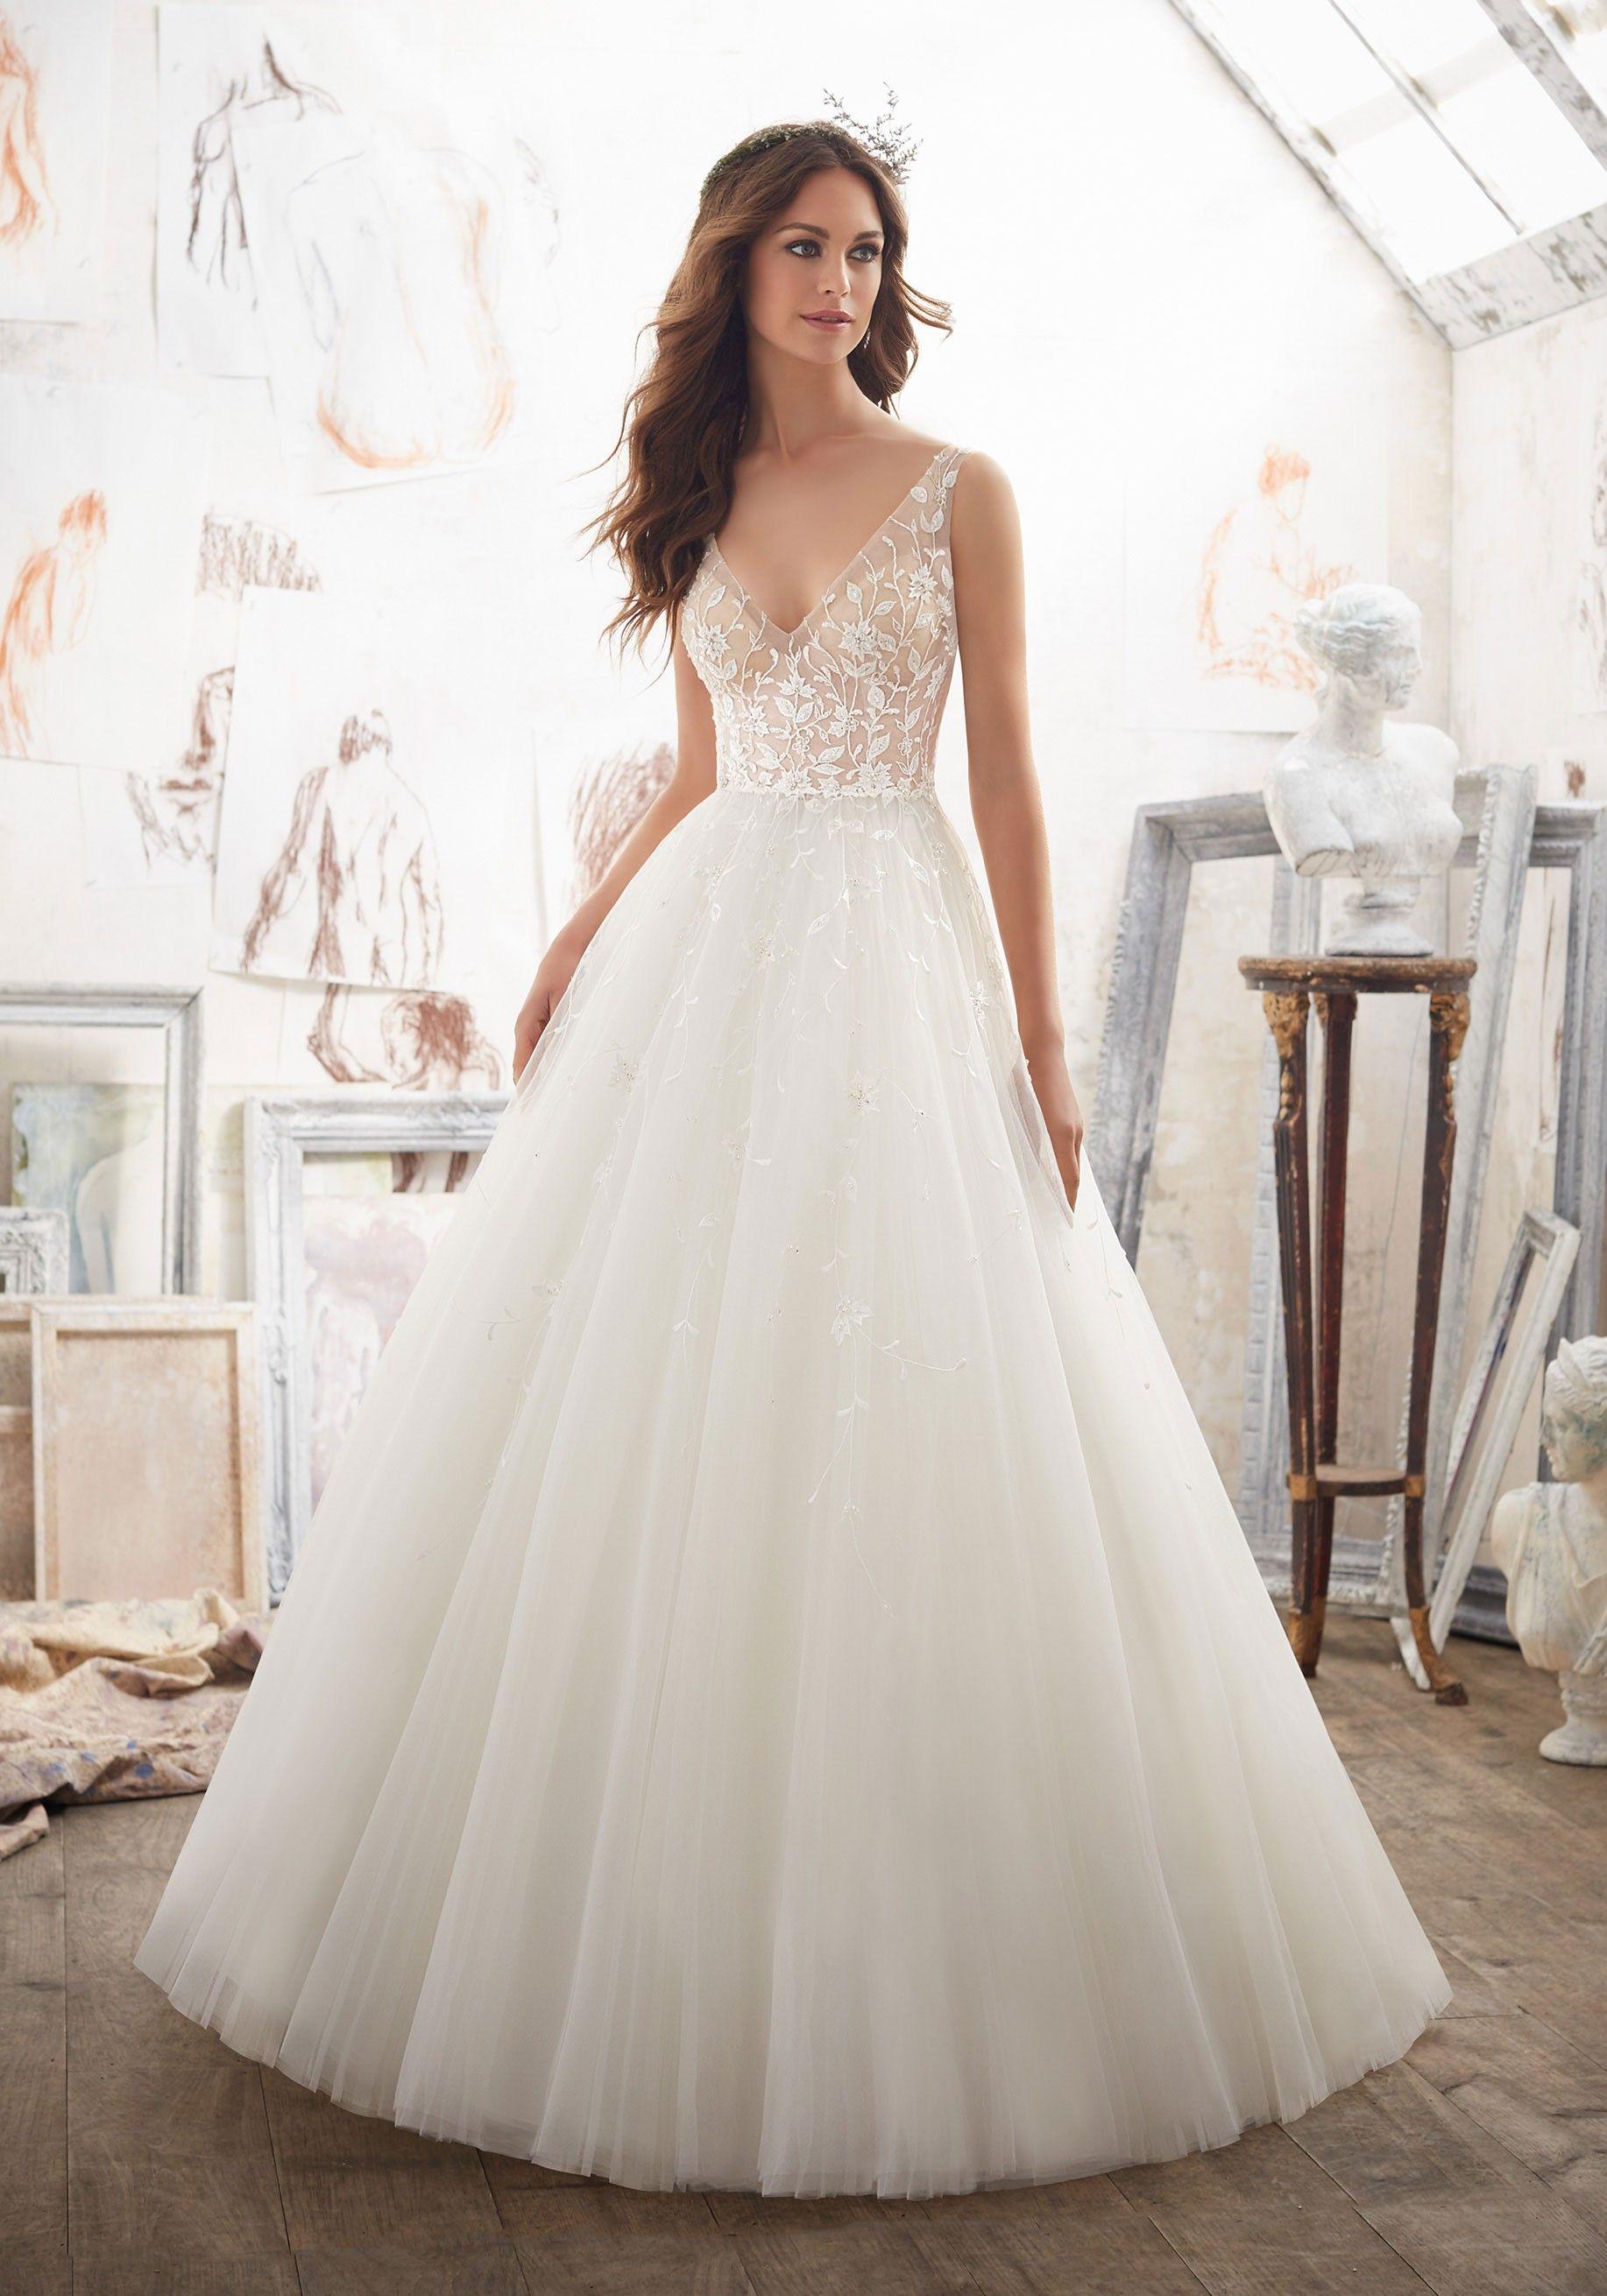 Wedding Dresses Bridesmaid Dresses Prom Dresses and